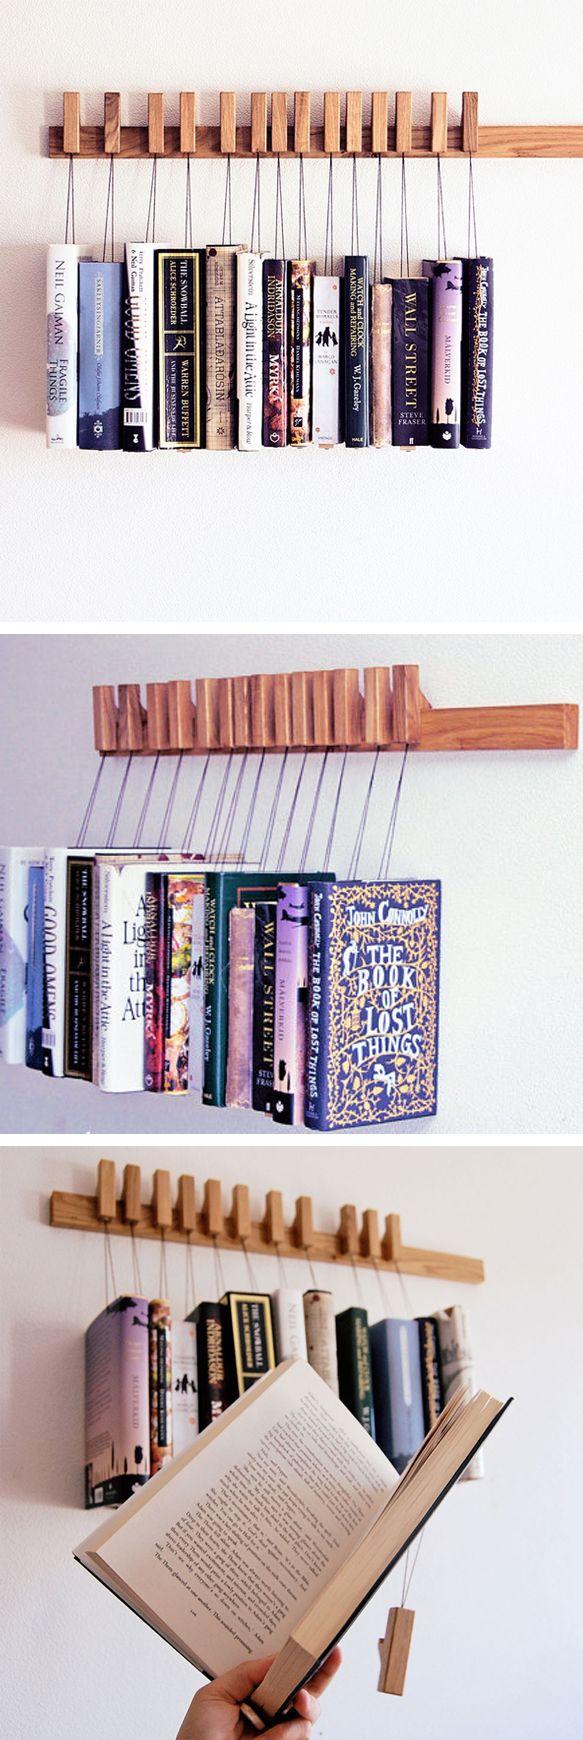 L 39 id e d co du samedi des livres suspendus floriane lemari - Deco bibliotheque originale ...